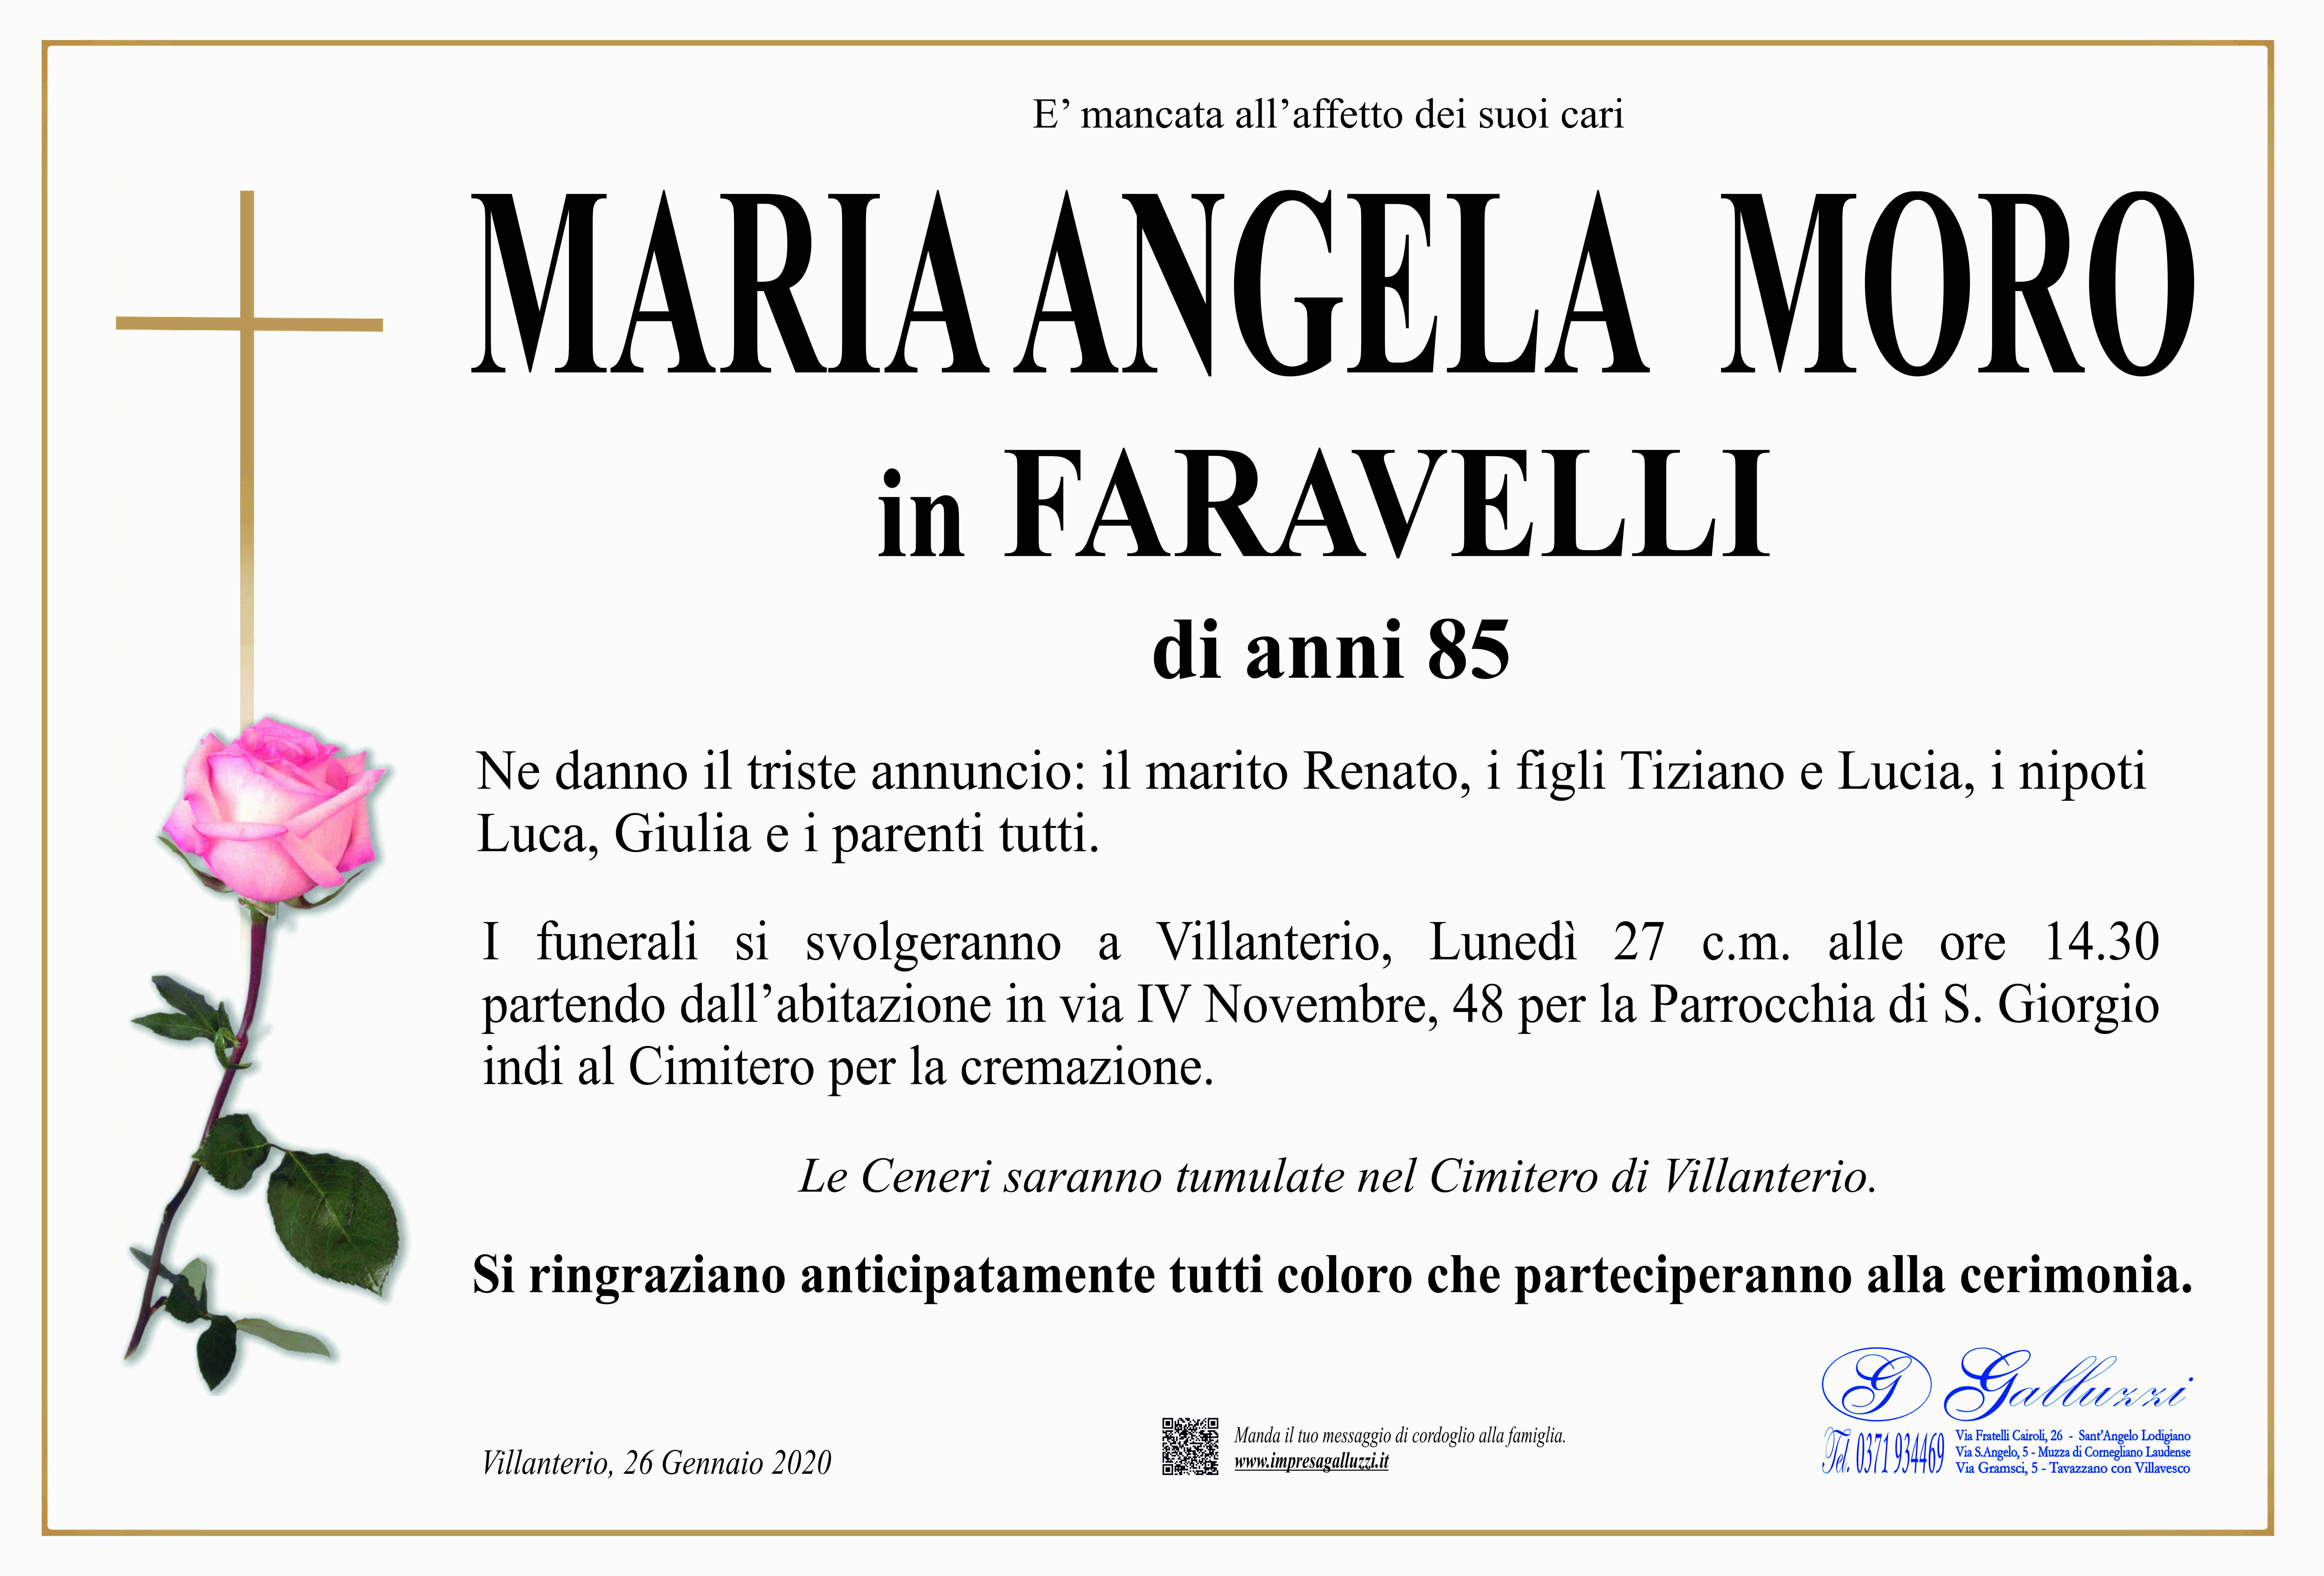 Maria Angela Moro